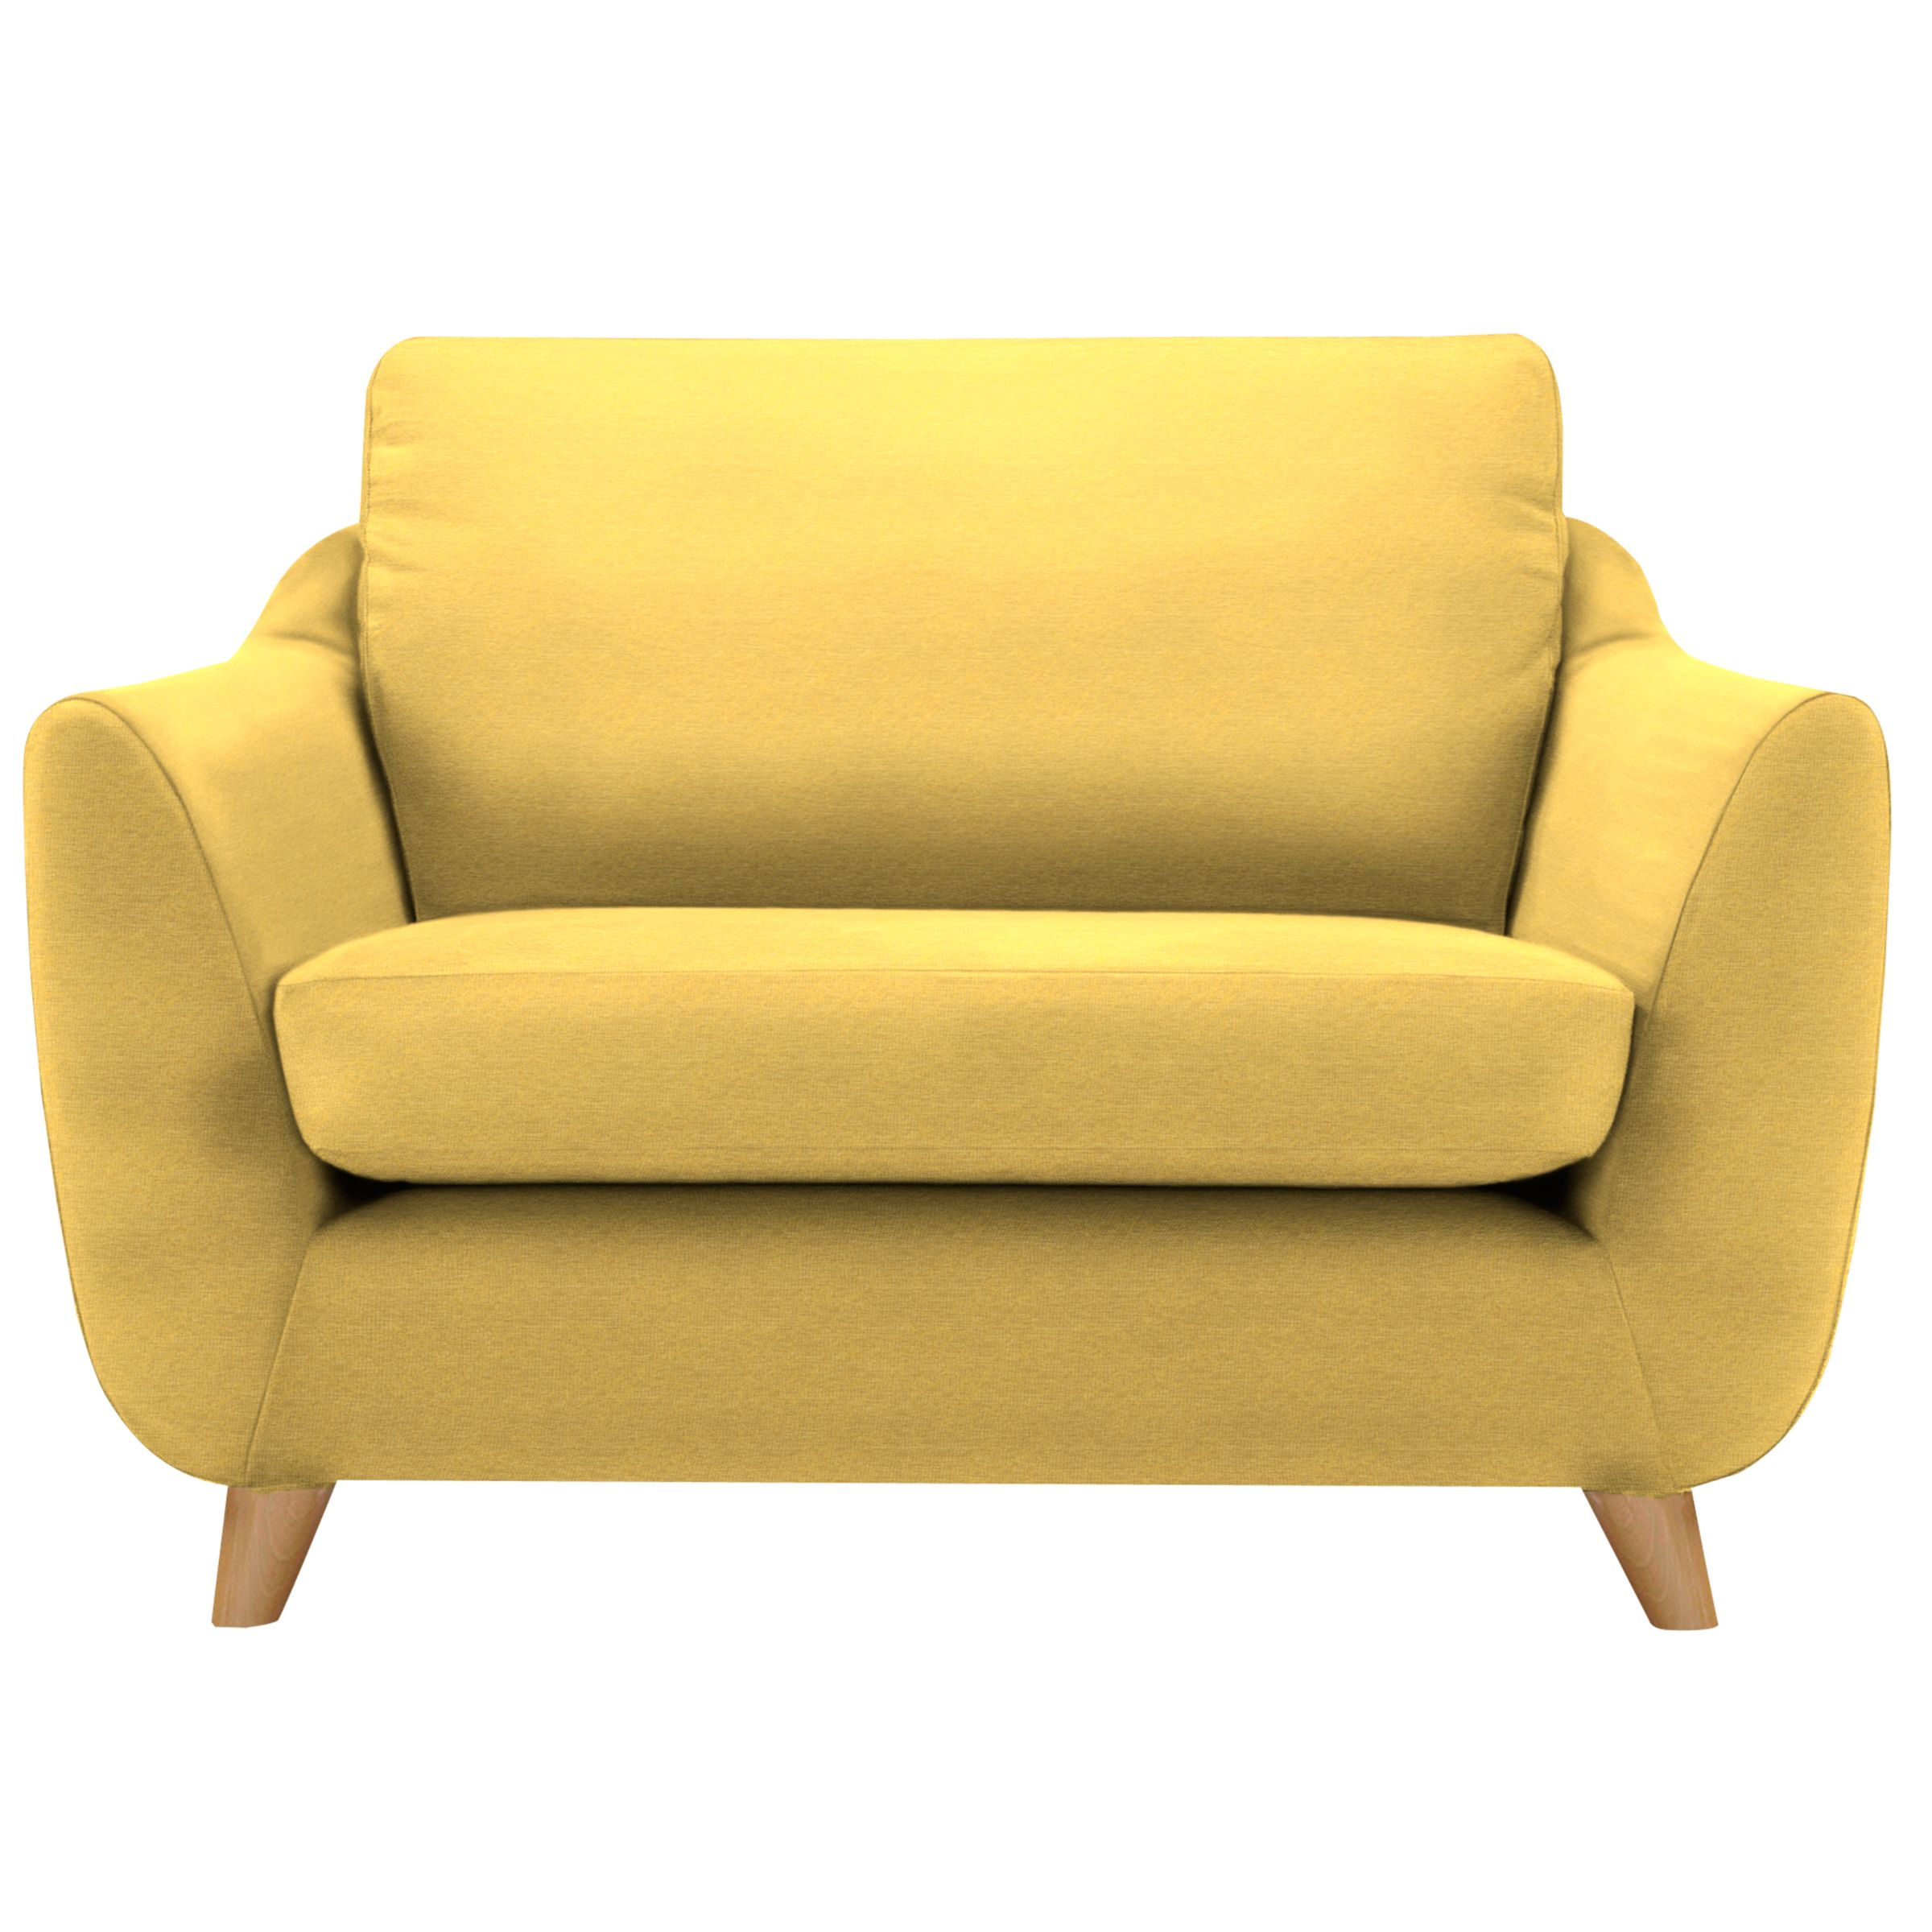 G Plan Vintage The Sixty Seven Snuggler, Tonic Mustard